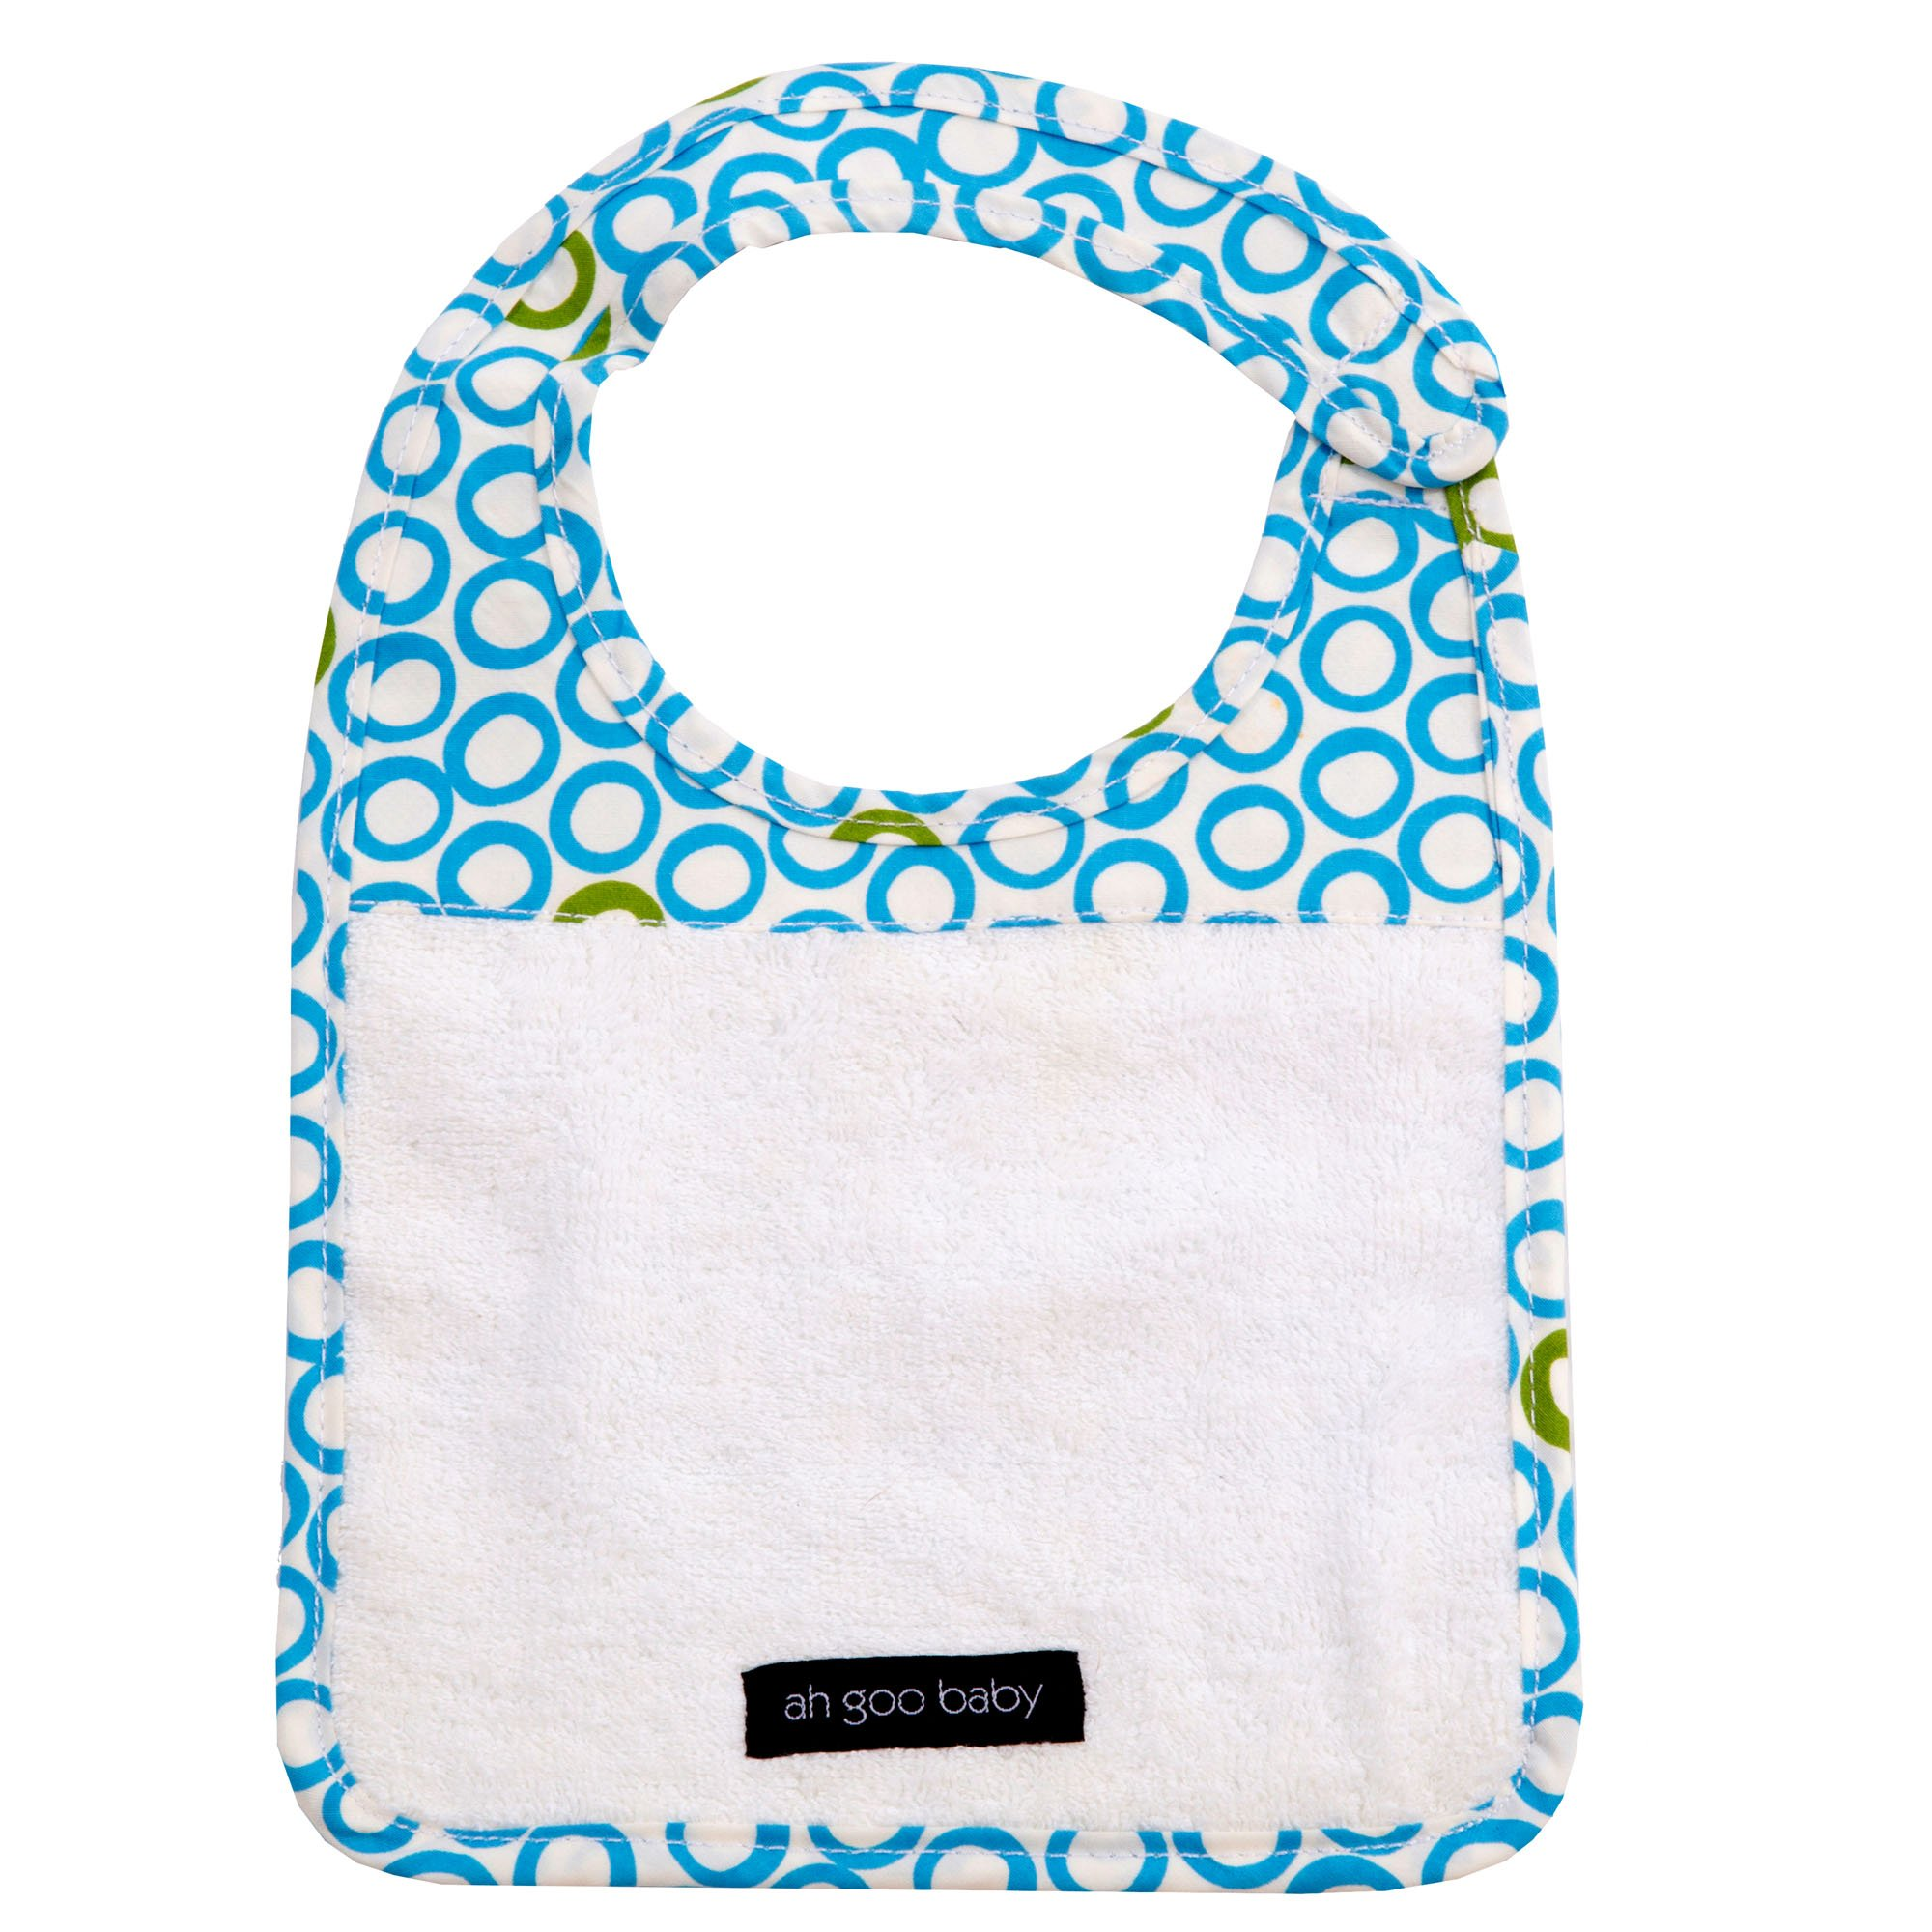 Ah Goo Baby Bib, 100% Cotton Terry Cloth, Wrap Around Collar, Bubbles in Water Pattern